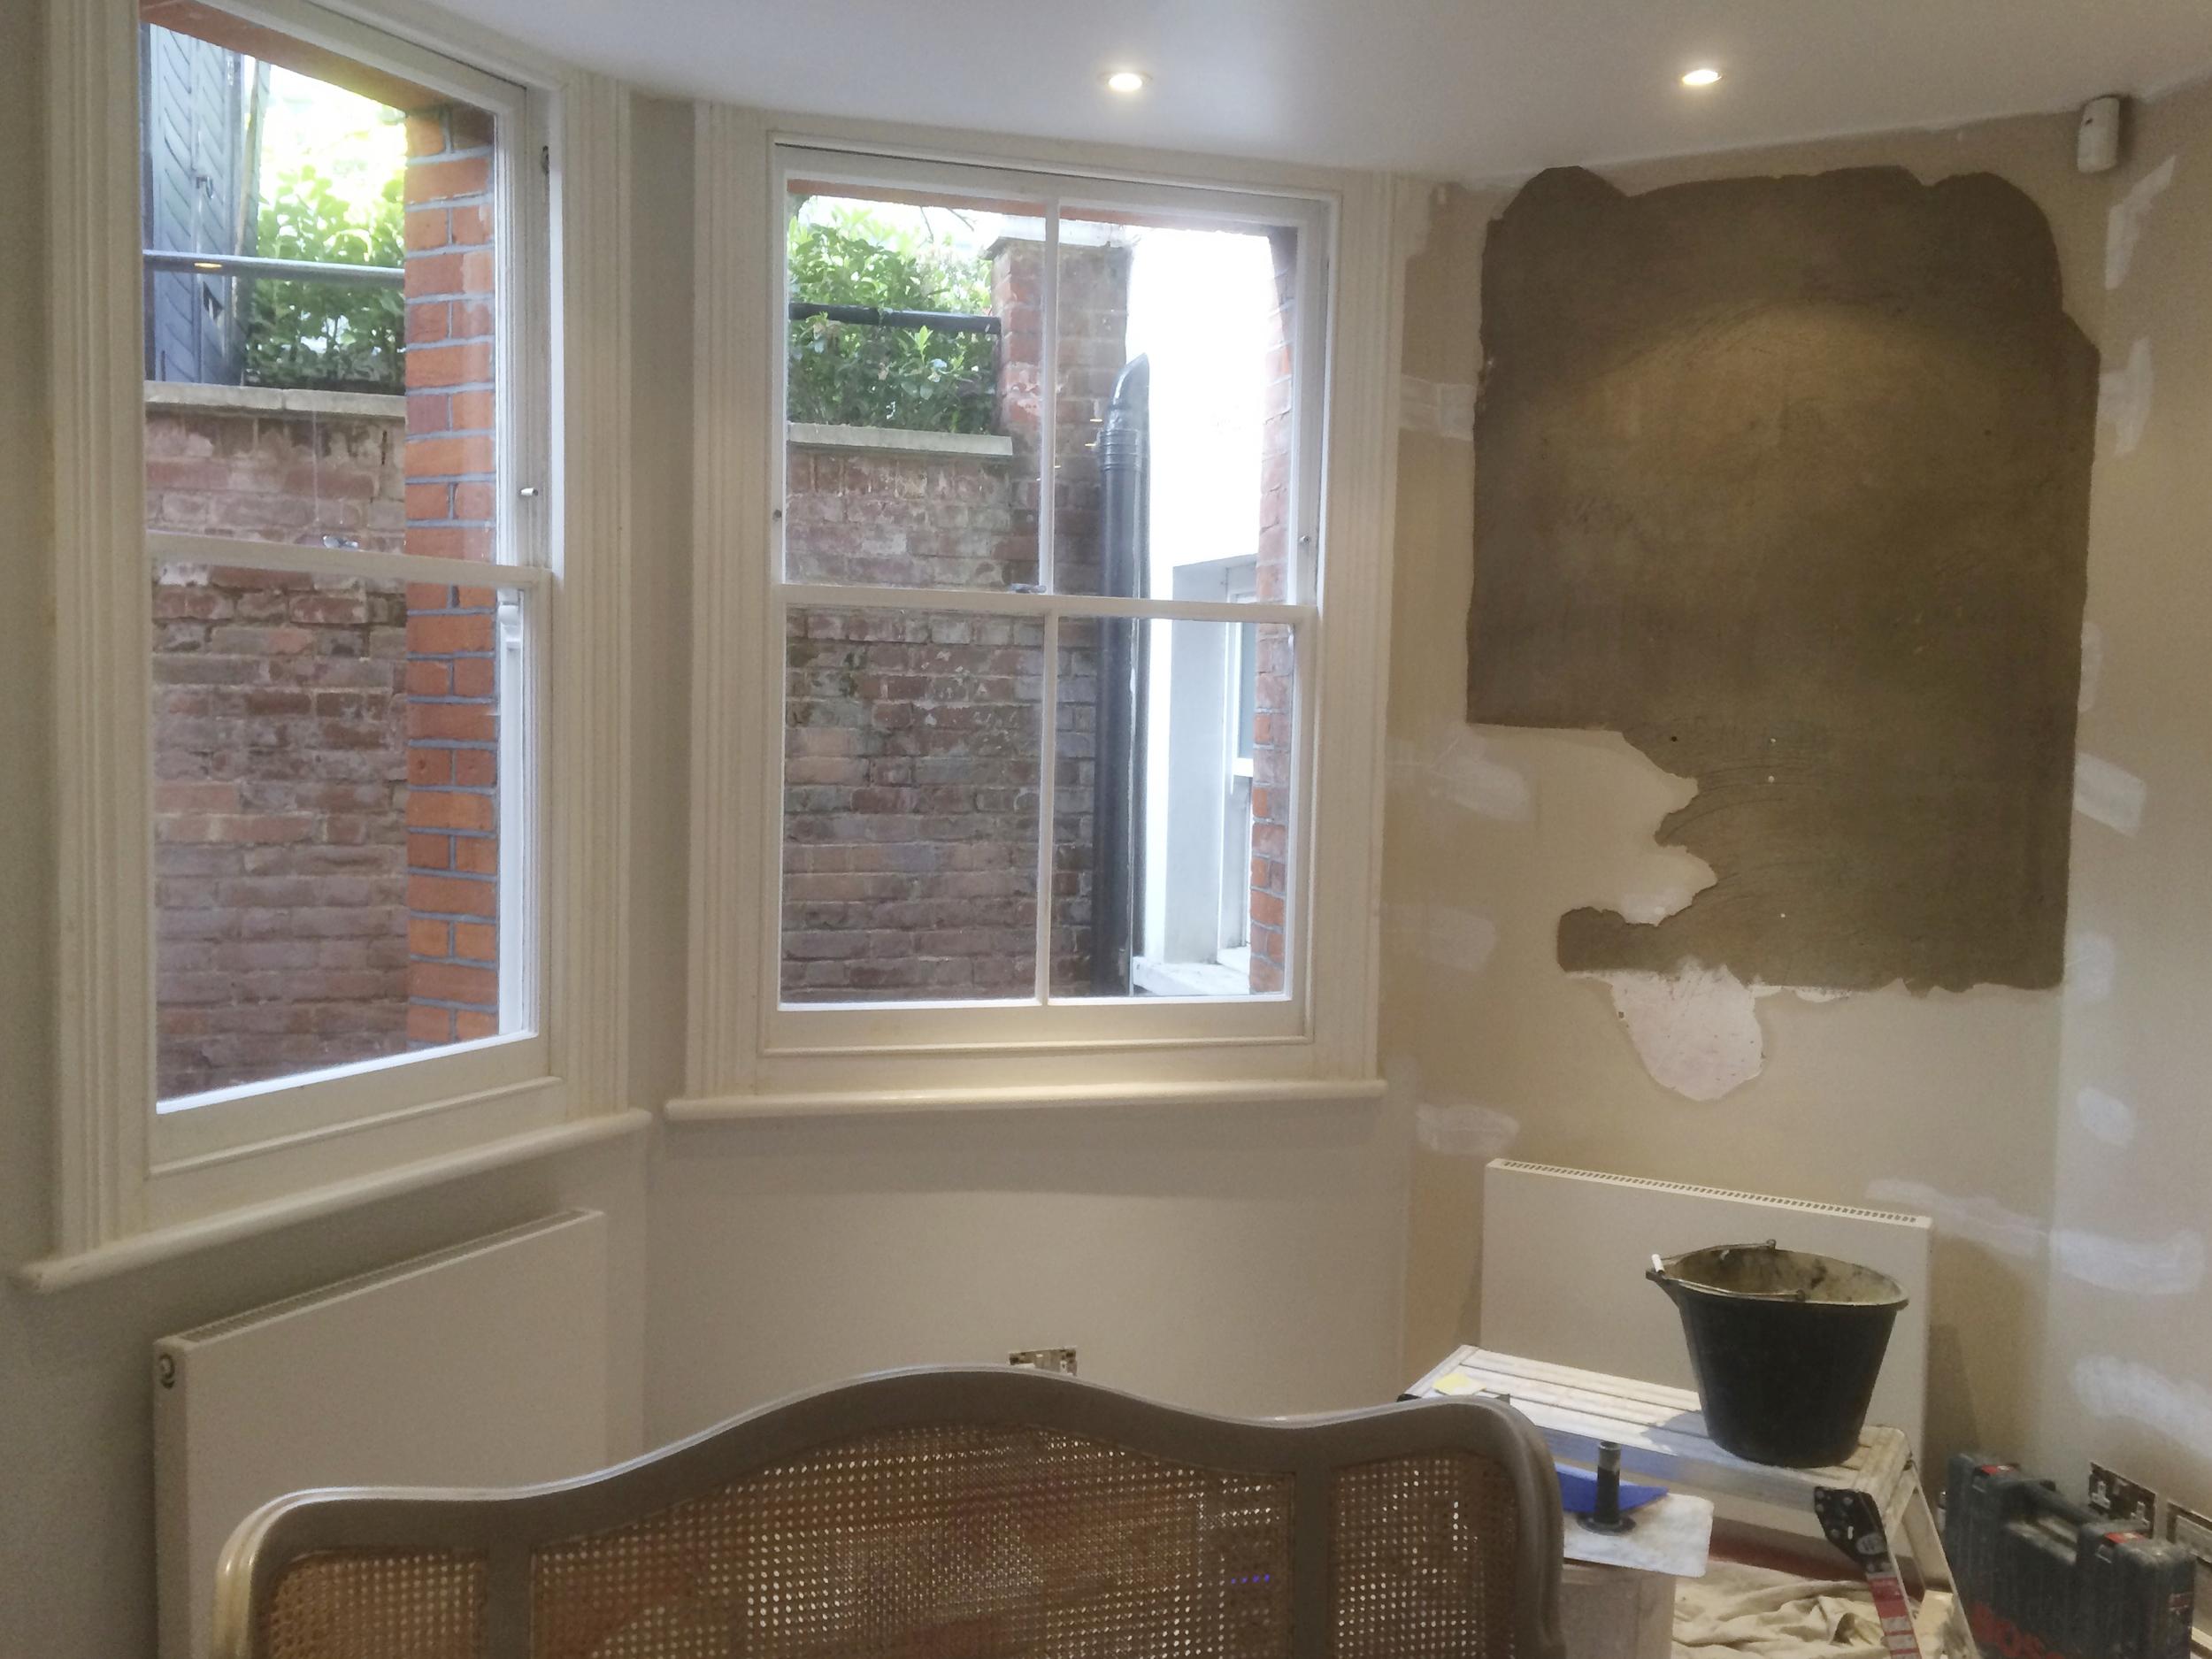 #NHRenovations #Painter #Decorator #London #PrimroseHill #Windows #BlownWalls #Patch #Plastering